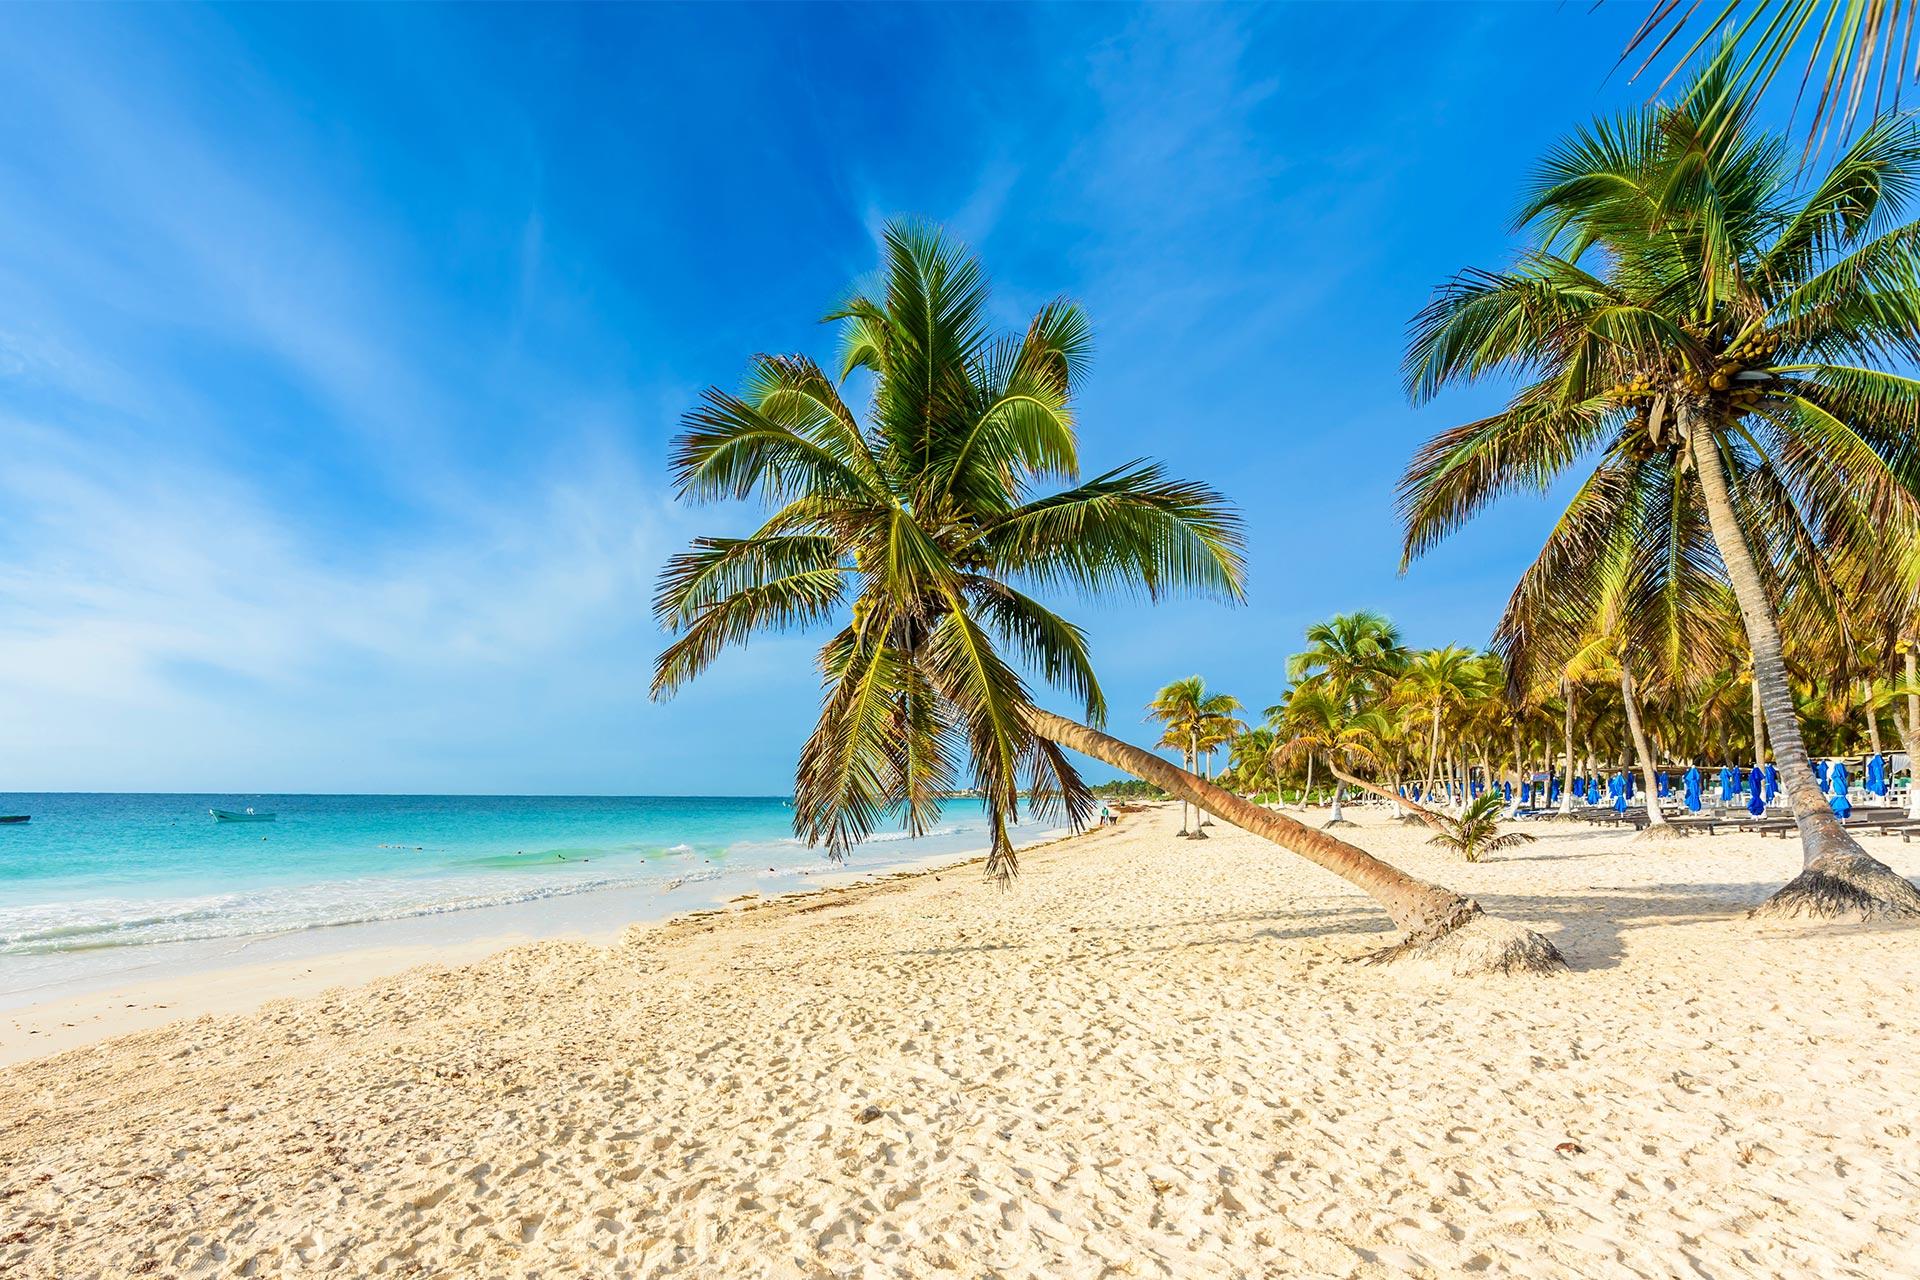 Sejur plaja Riviera Maya, Mexic, 9 zile - Noiembrie 2021